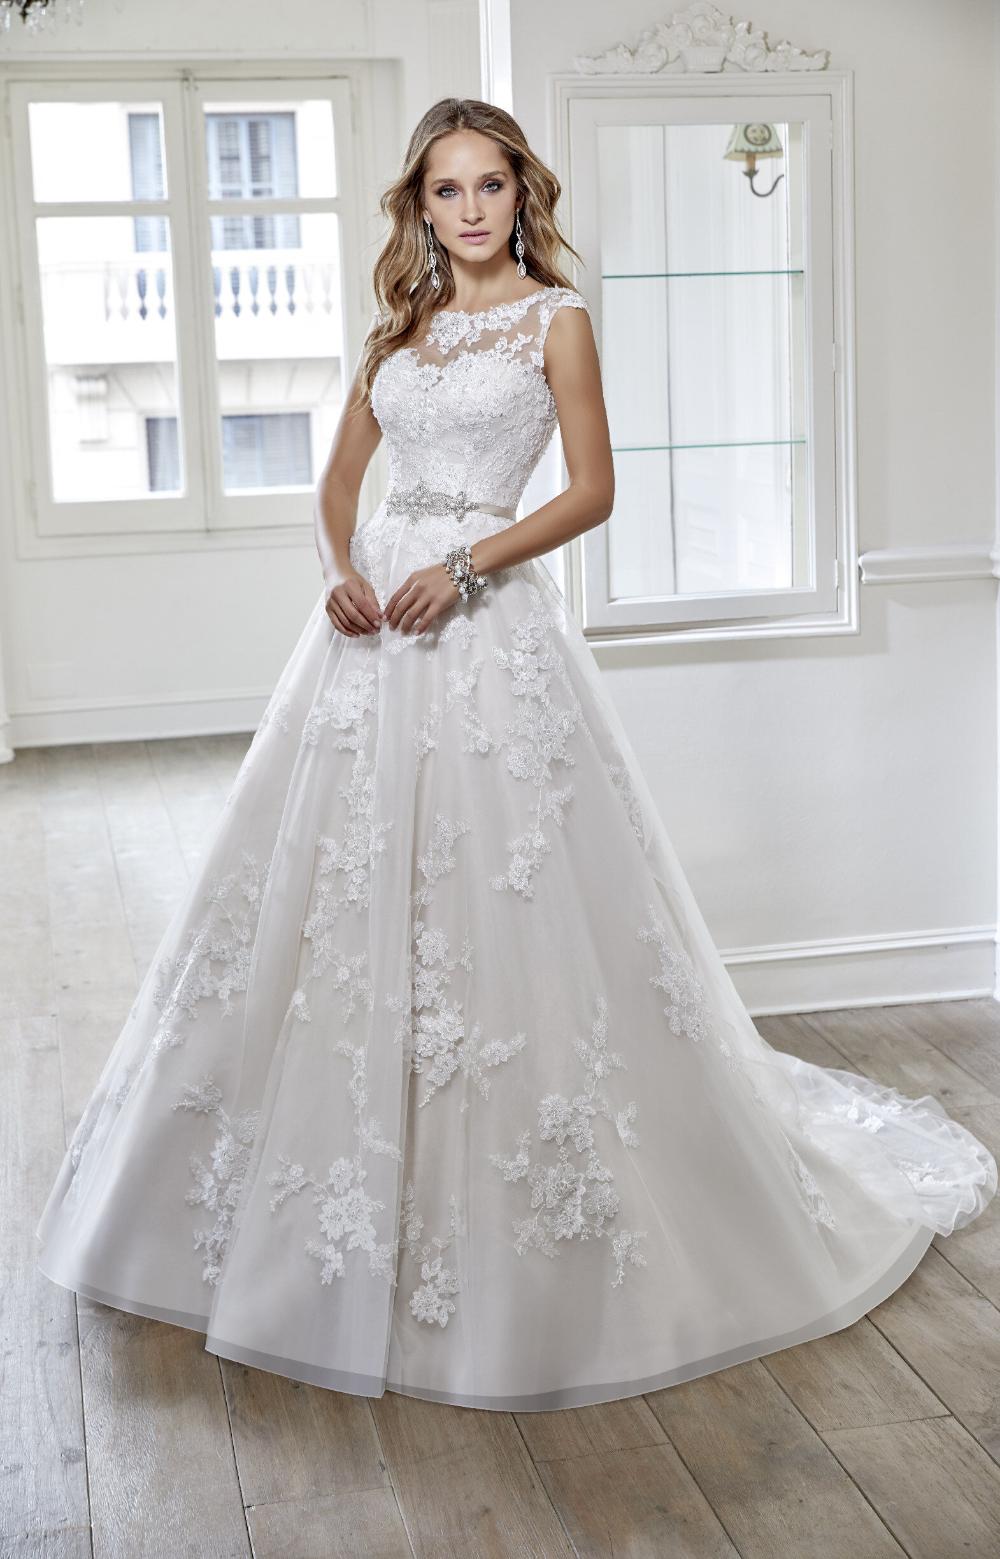 Robyn Ronald Joyce 68060 Bridal Shop West Yorkshire In 2020 Ronald Joyce Wedding Dresses Wedding Dresses Strapless Wedding Dress Tulle Lace